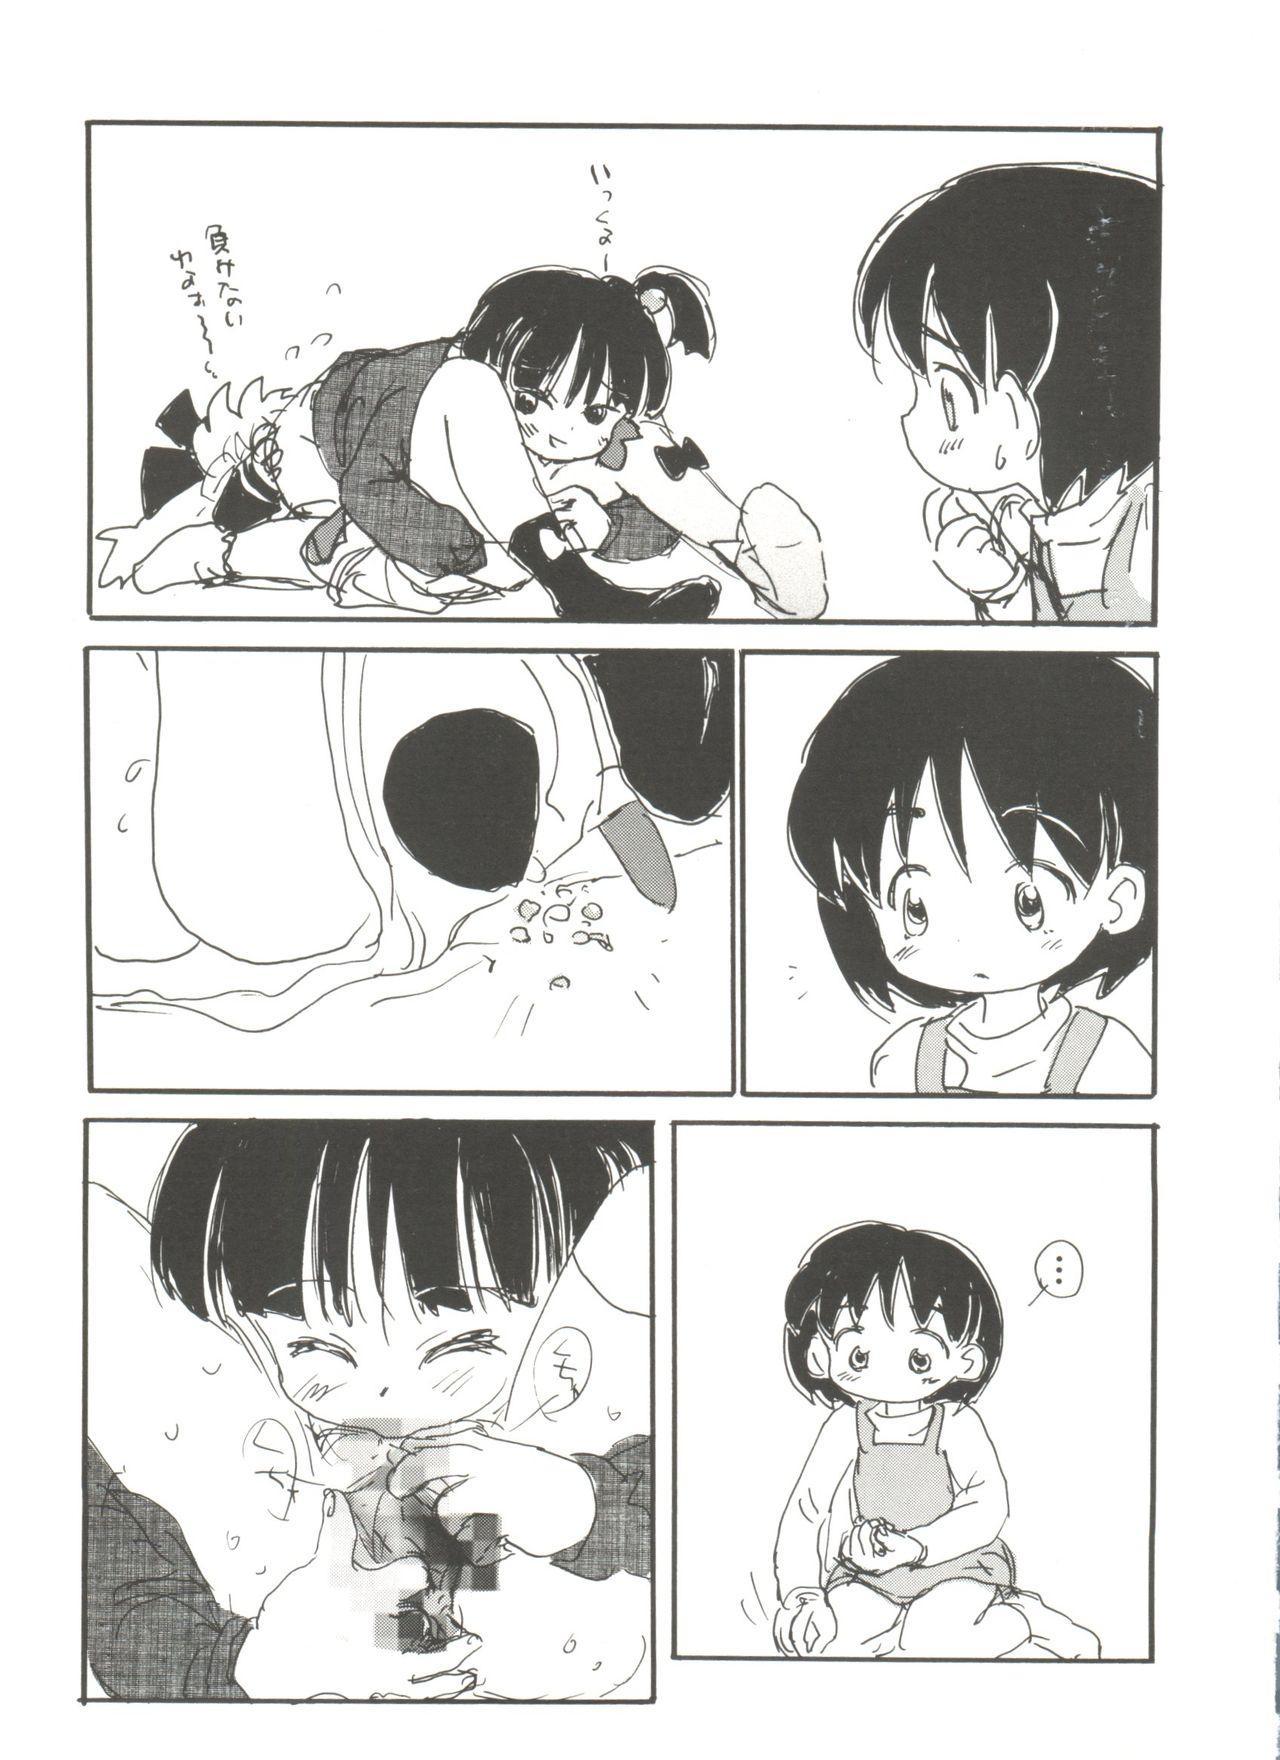 [Anthology] Denei Tamatebako 8 - Utakata no Tenshi-tachi II (Various) 24